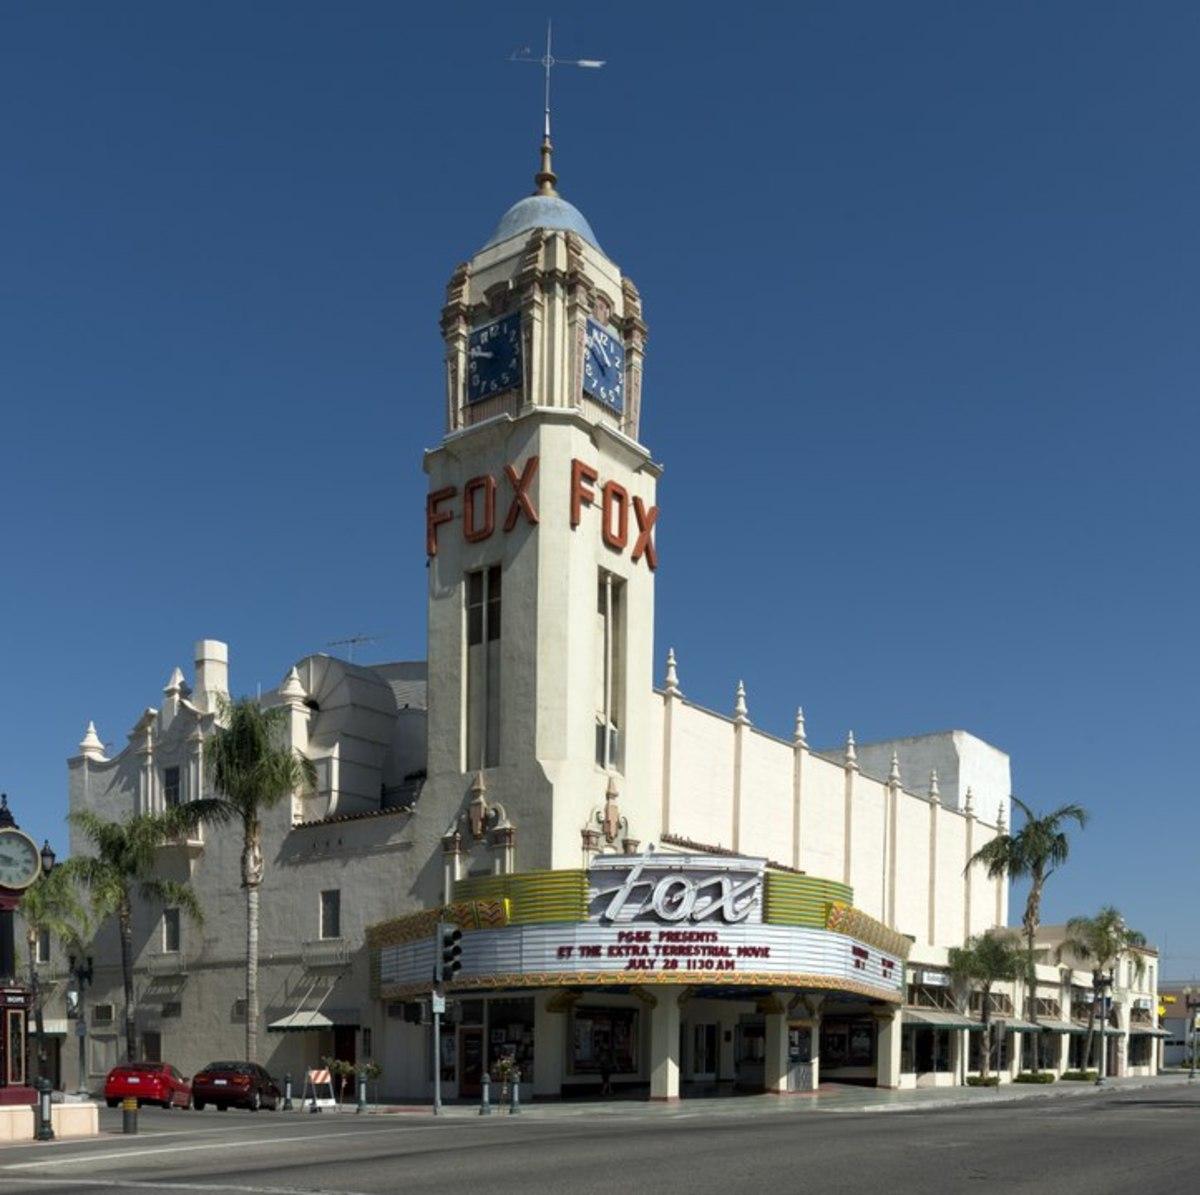 Fox Theater, Bakersfield CA.